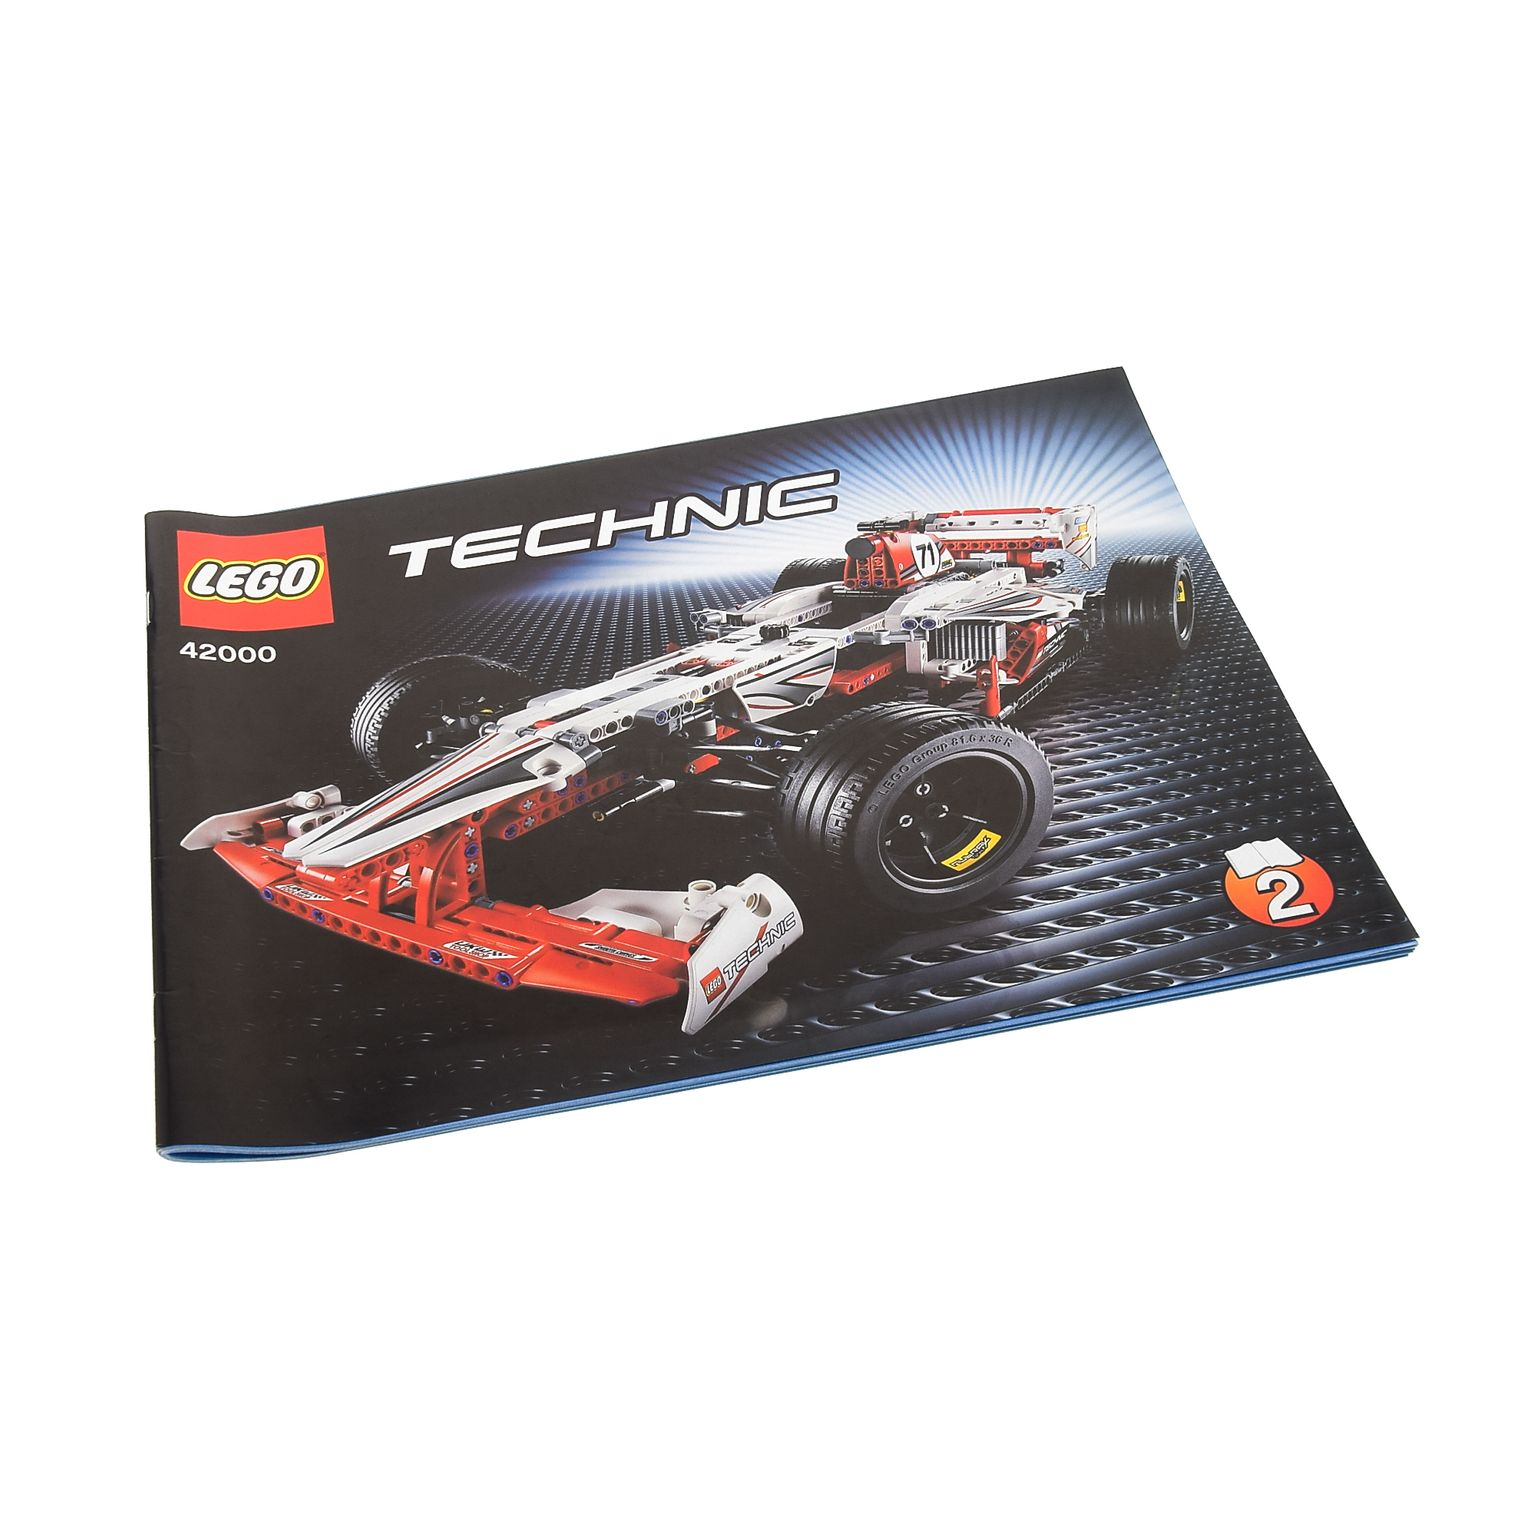 1 X Lego Brick Technic Instructions Model Grand Prix Racer Booklet 2